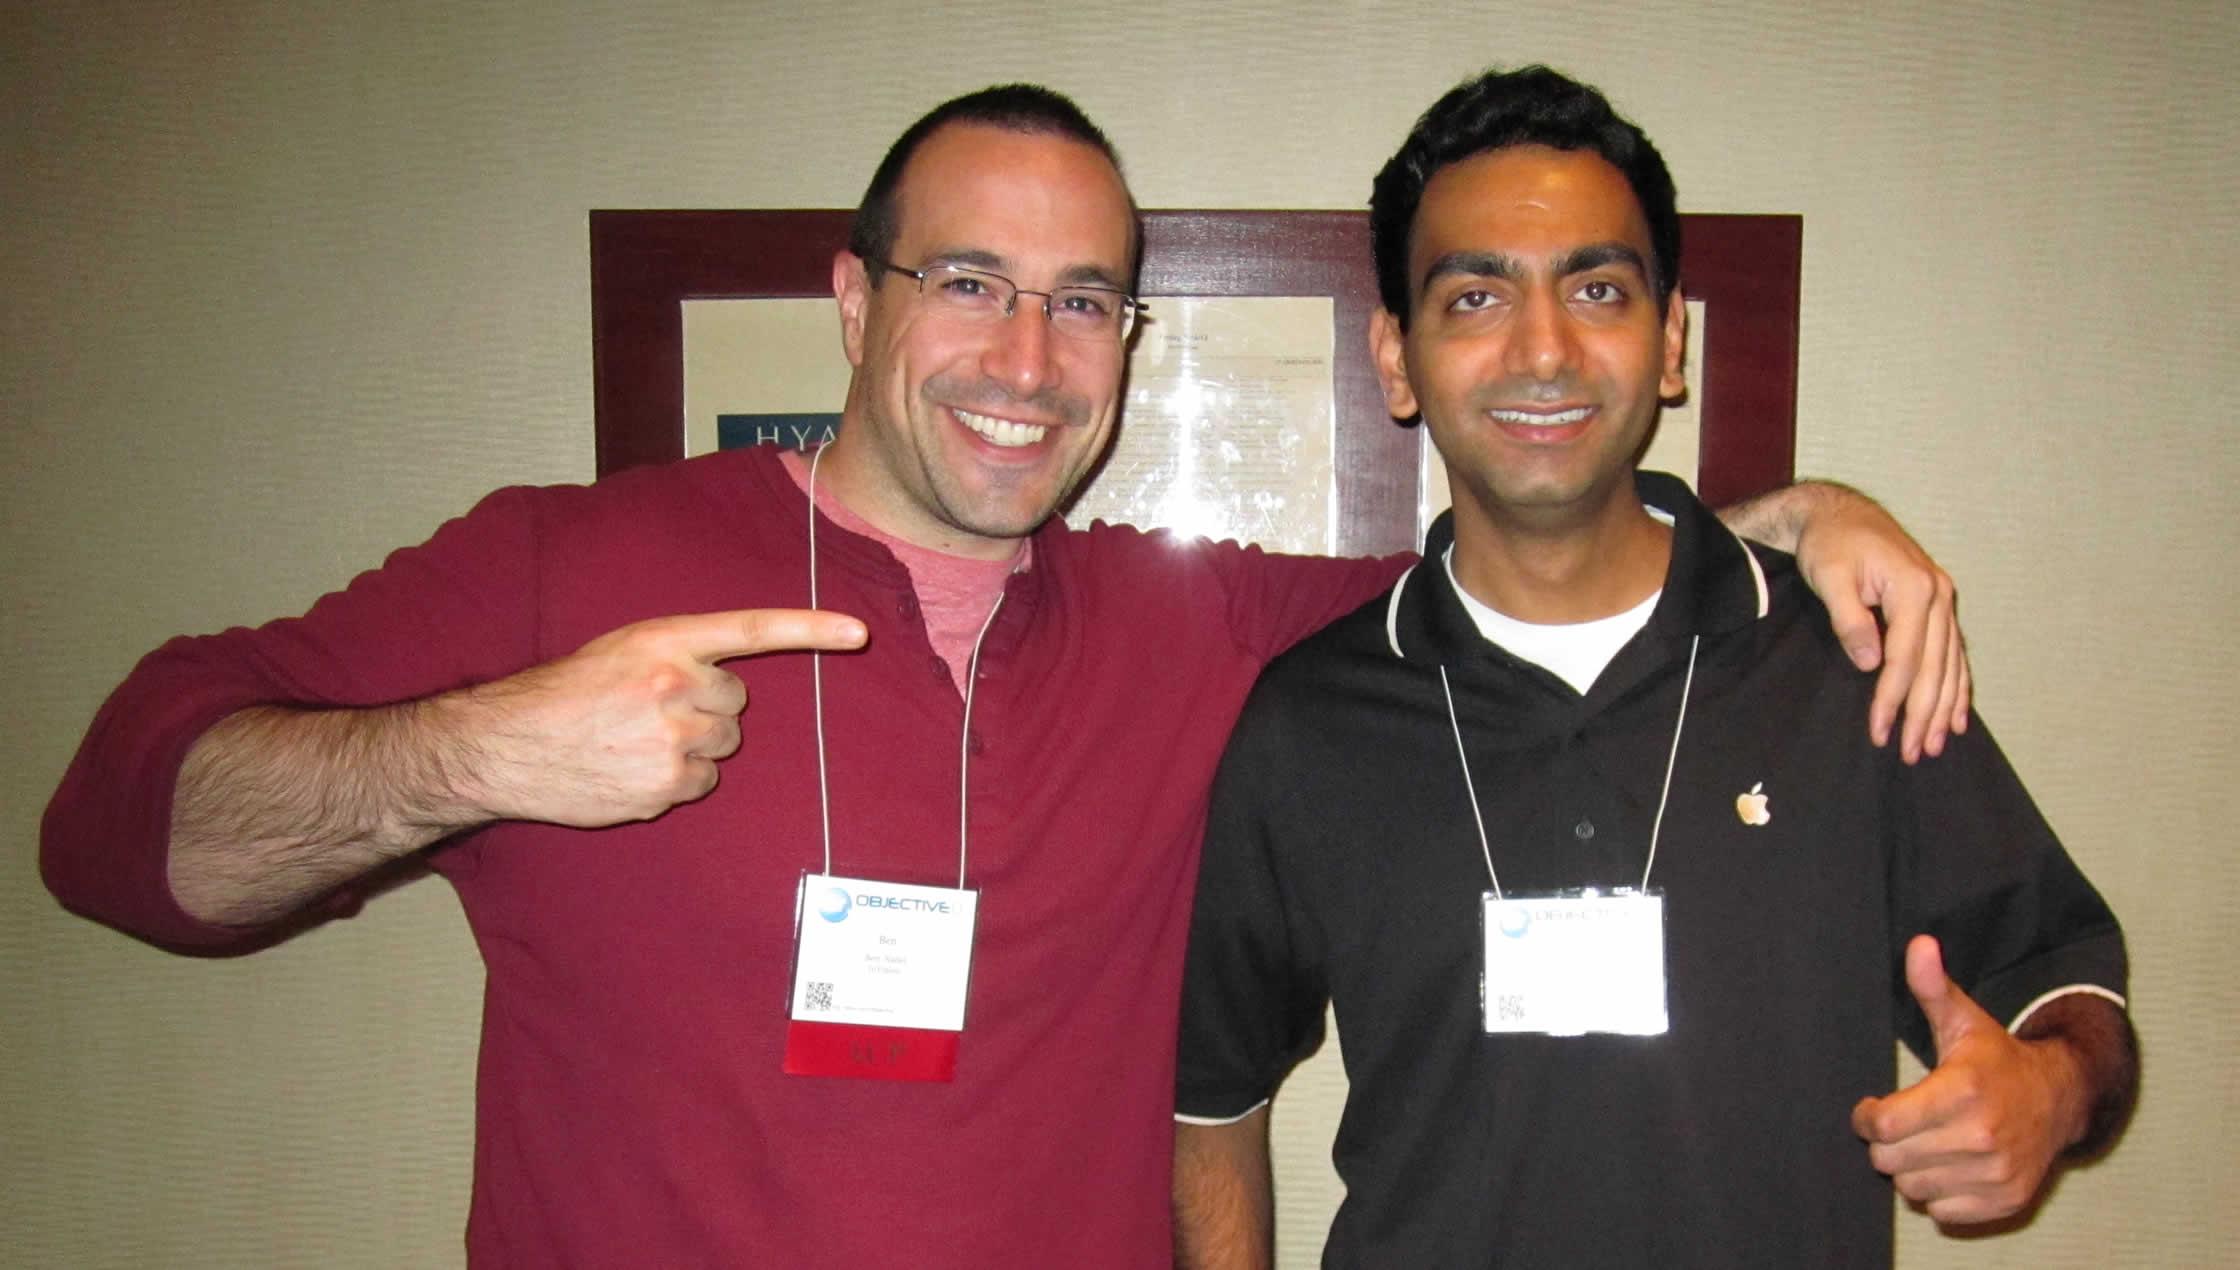 Ben Nadel at cf.Objective() 2012 (Minneapolis, MN) with: Rachit Arora